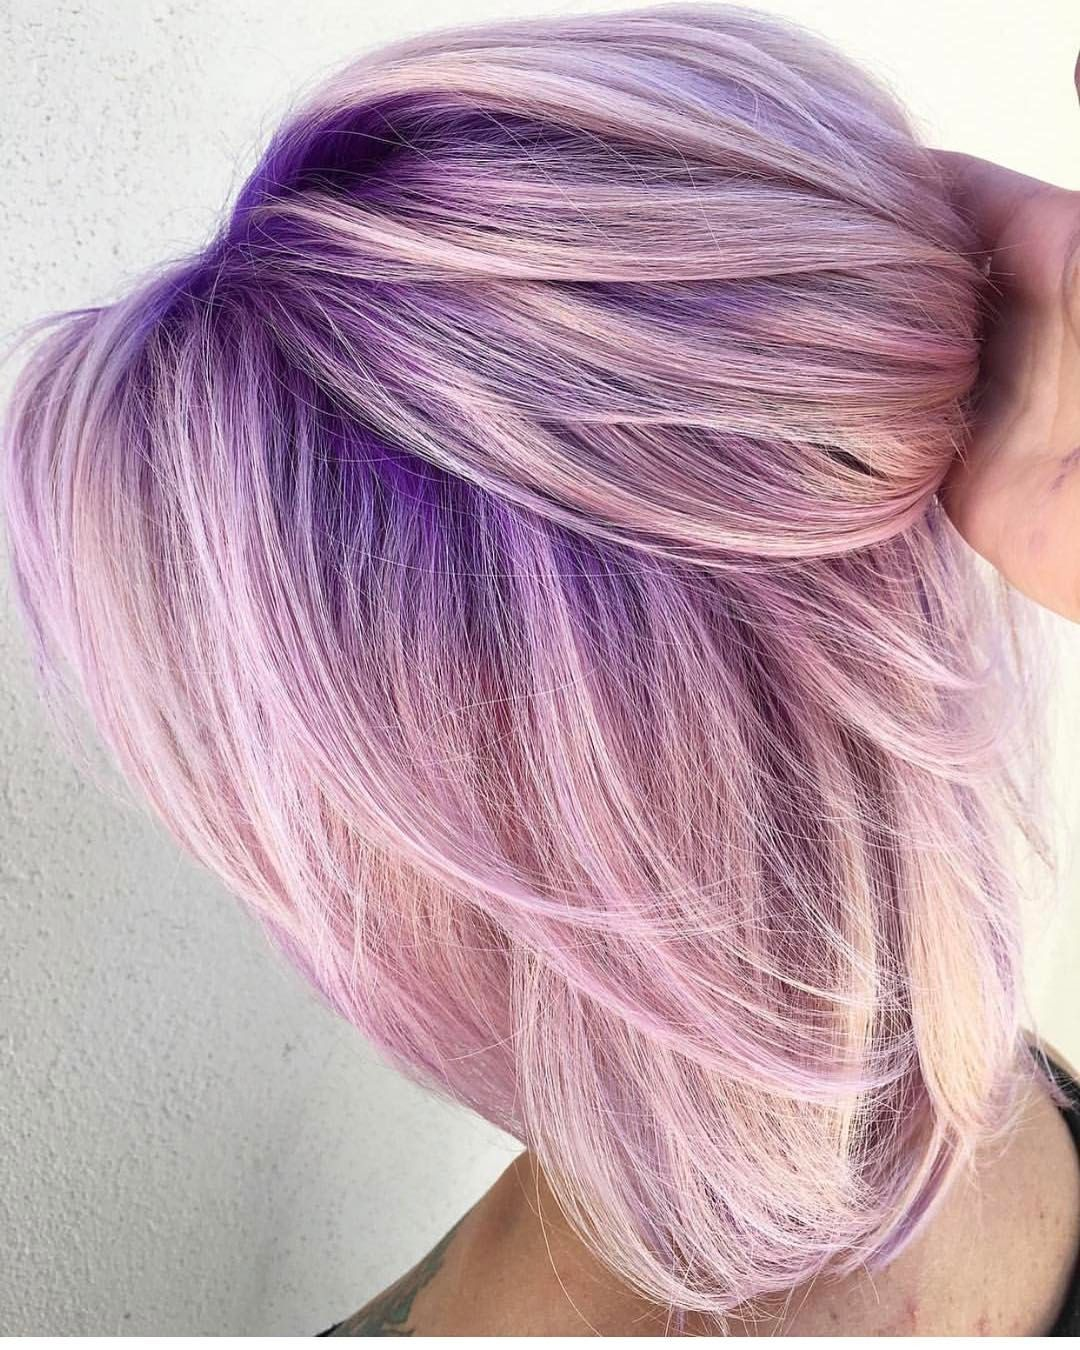 Pin by liz delahunty on hair pinterest hair unicorn hair and